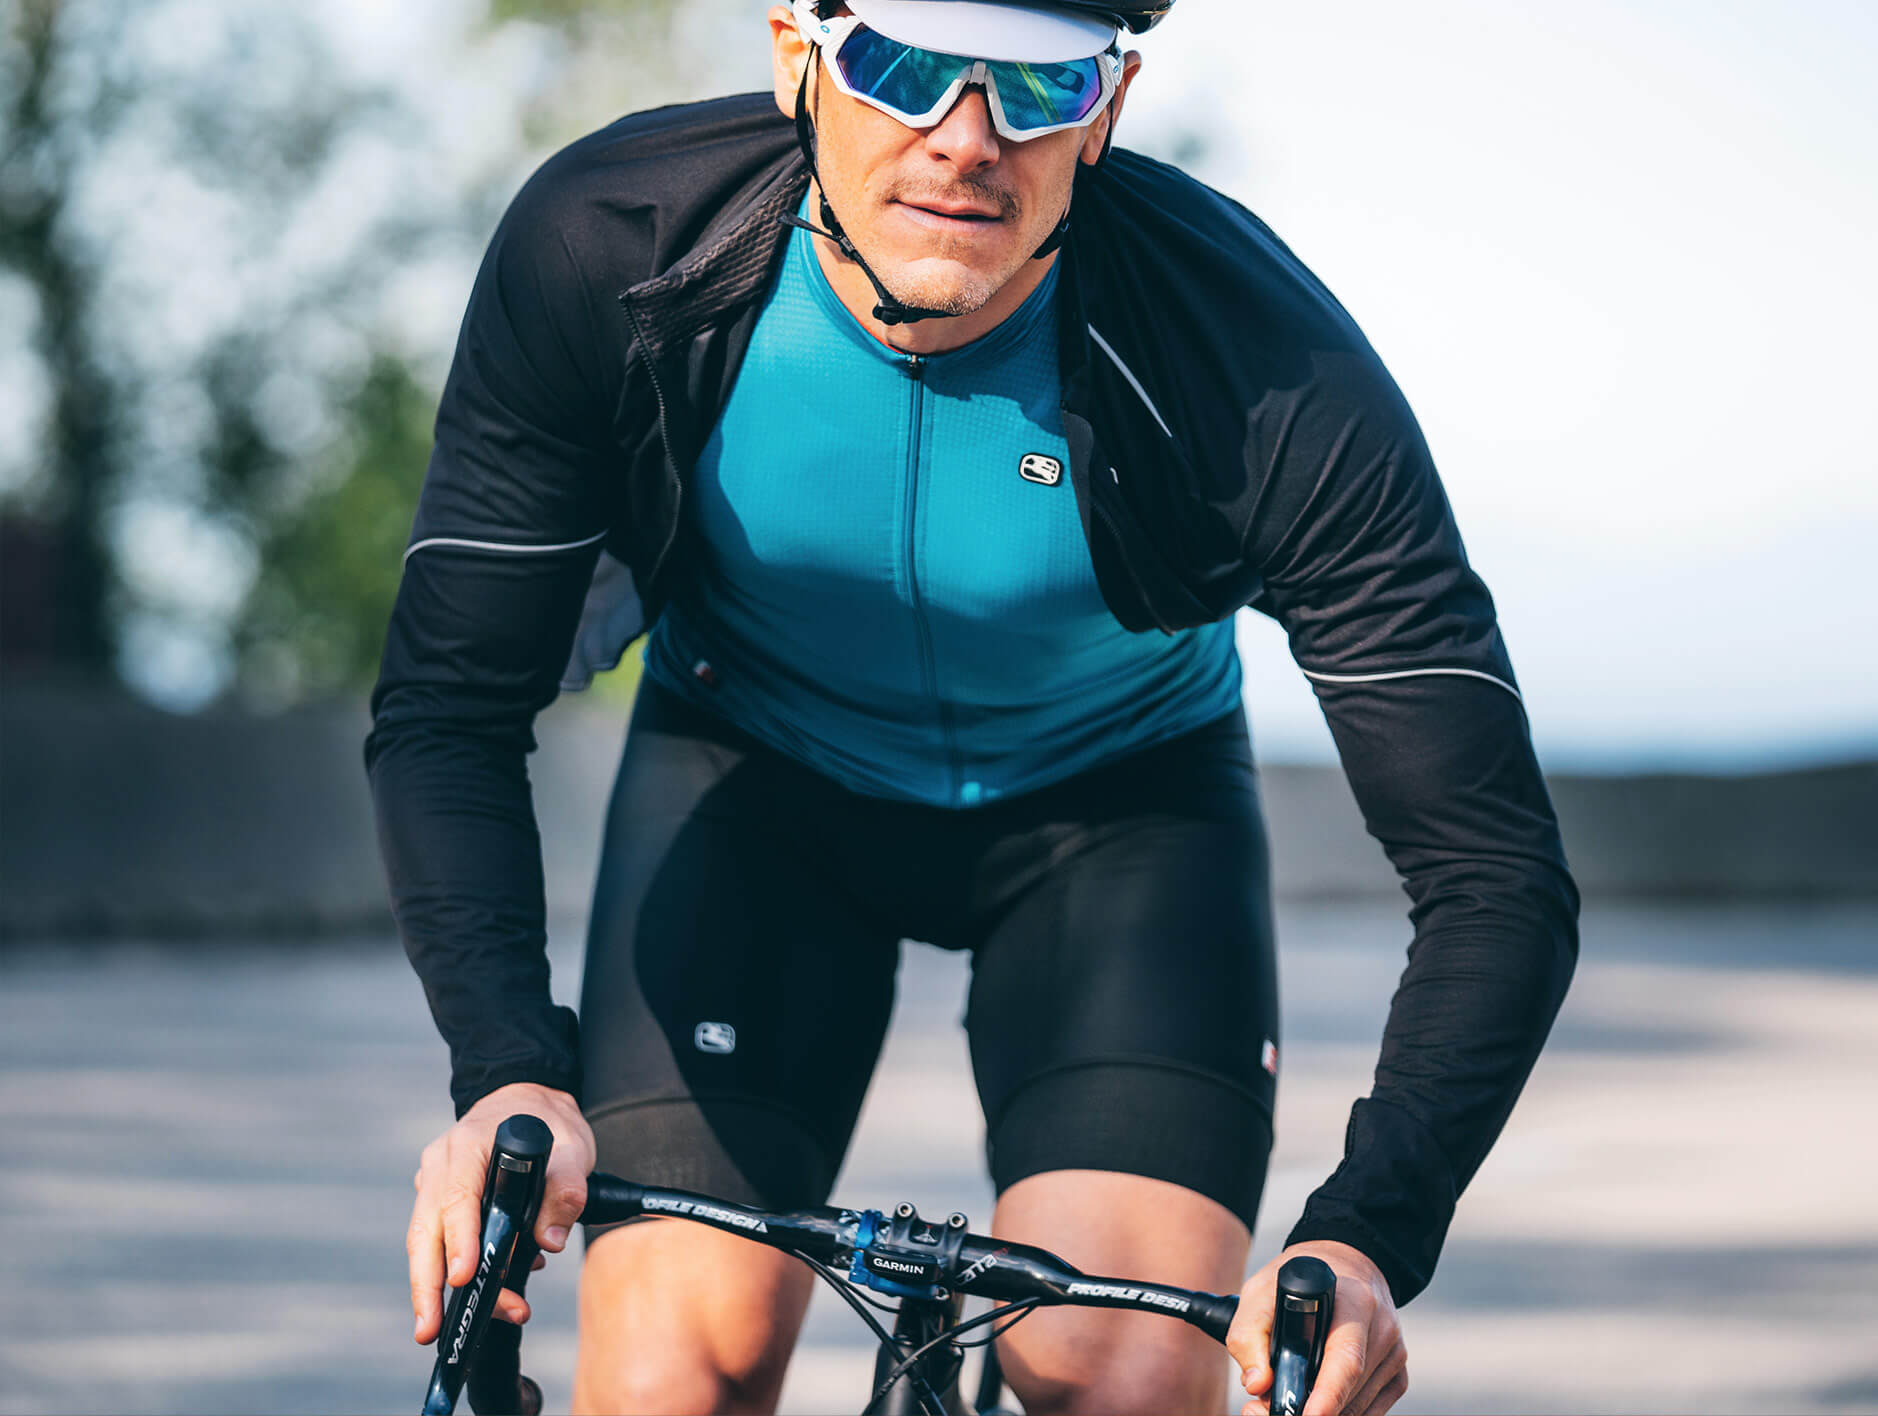 giordana-cycling-bib-short-guide-fr-c-large-1